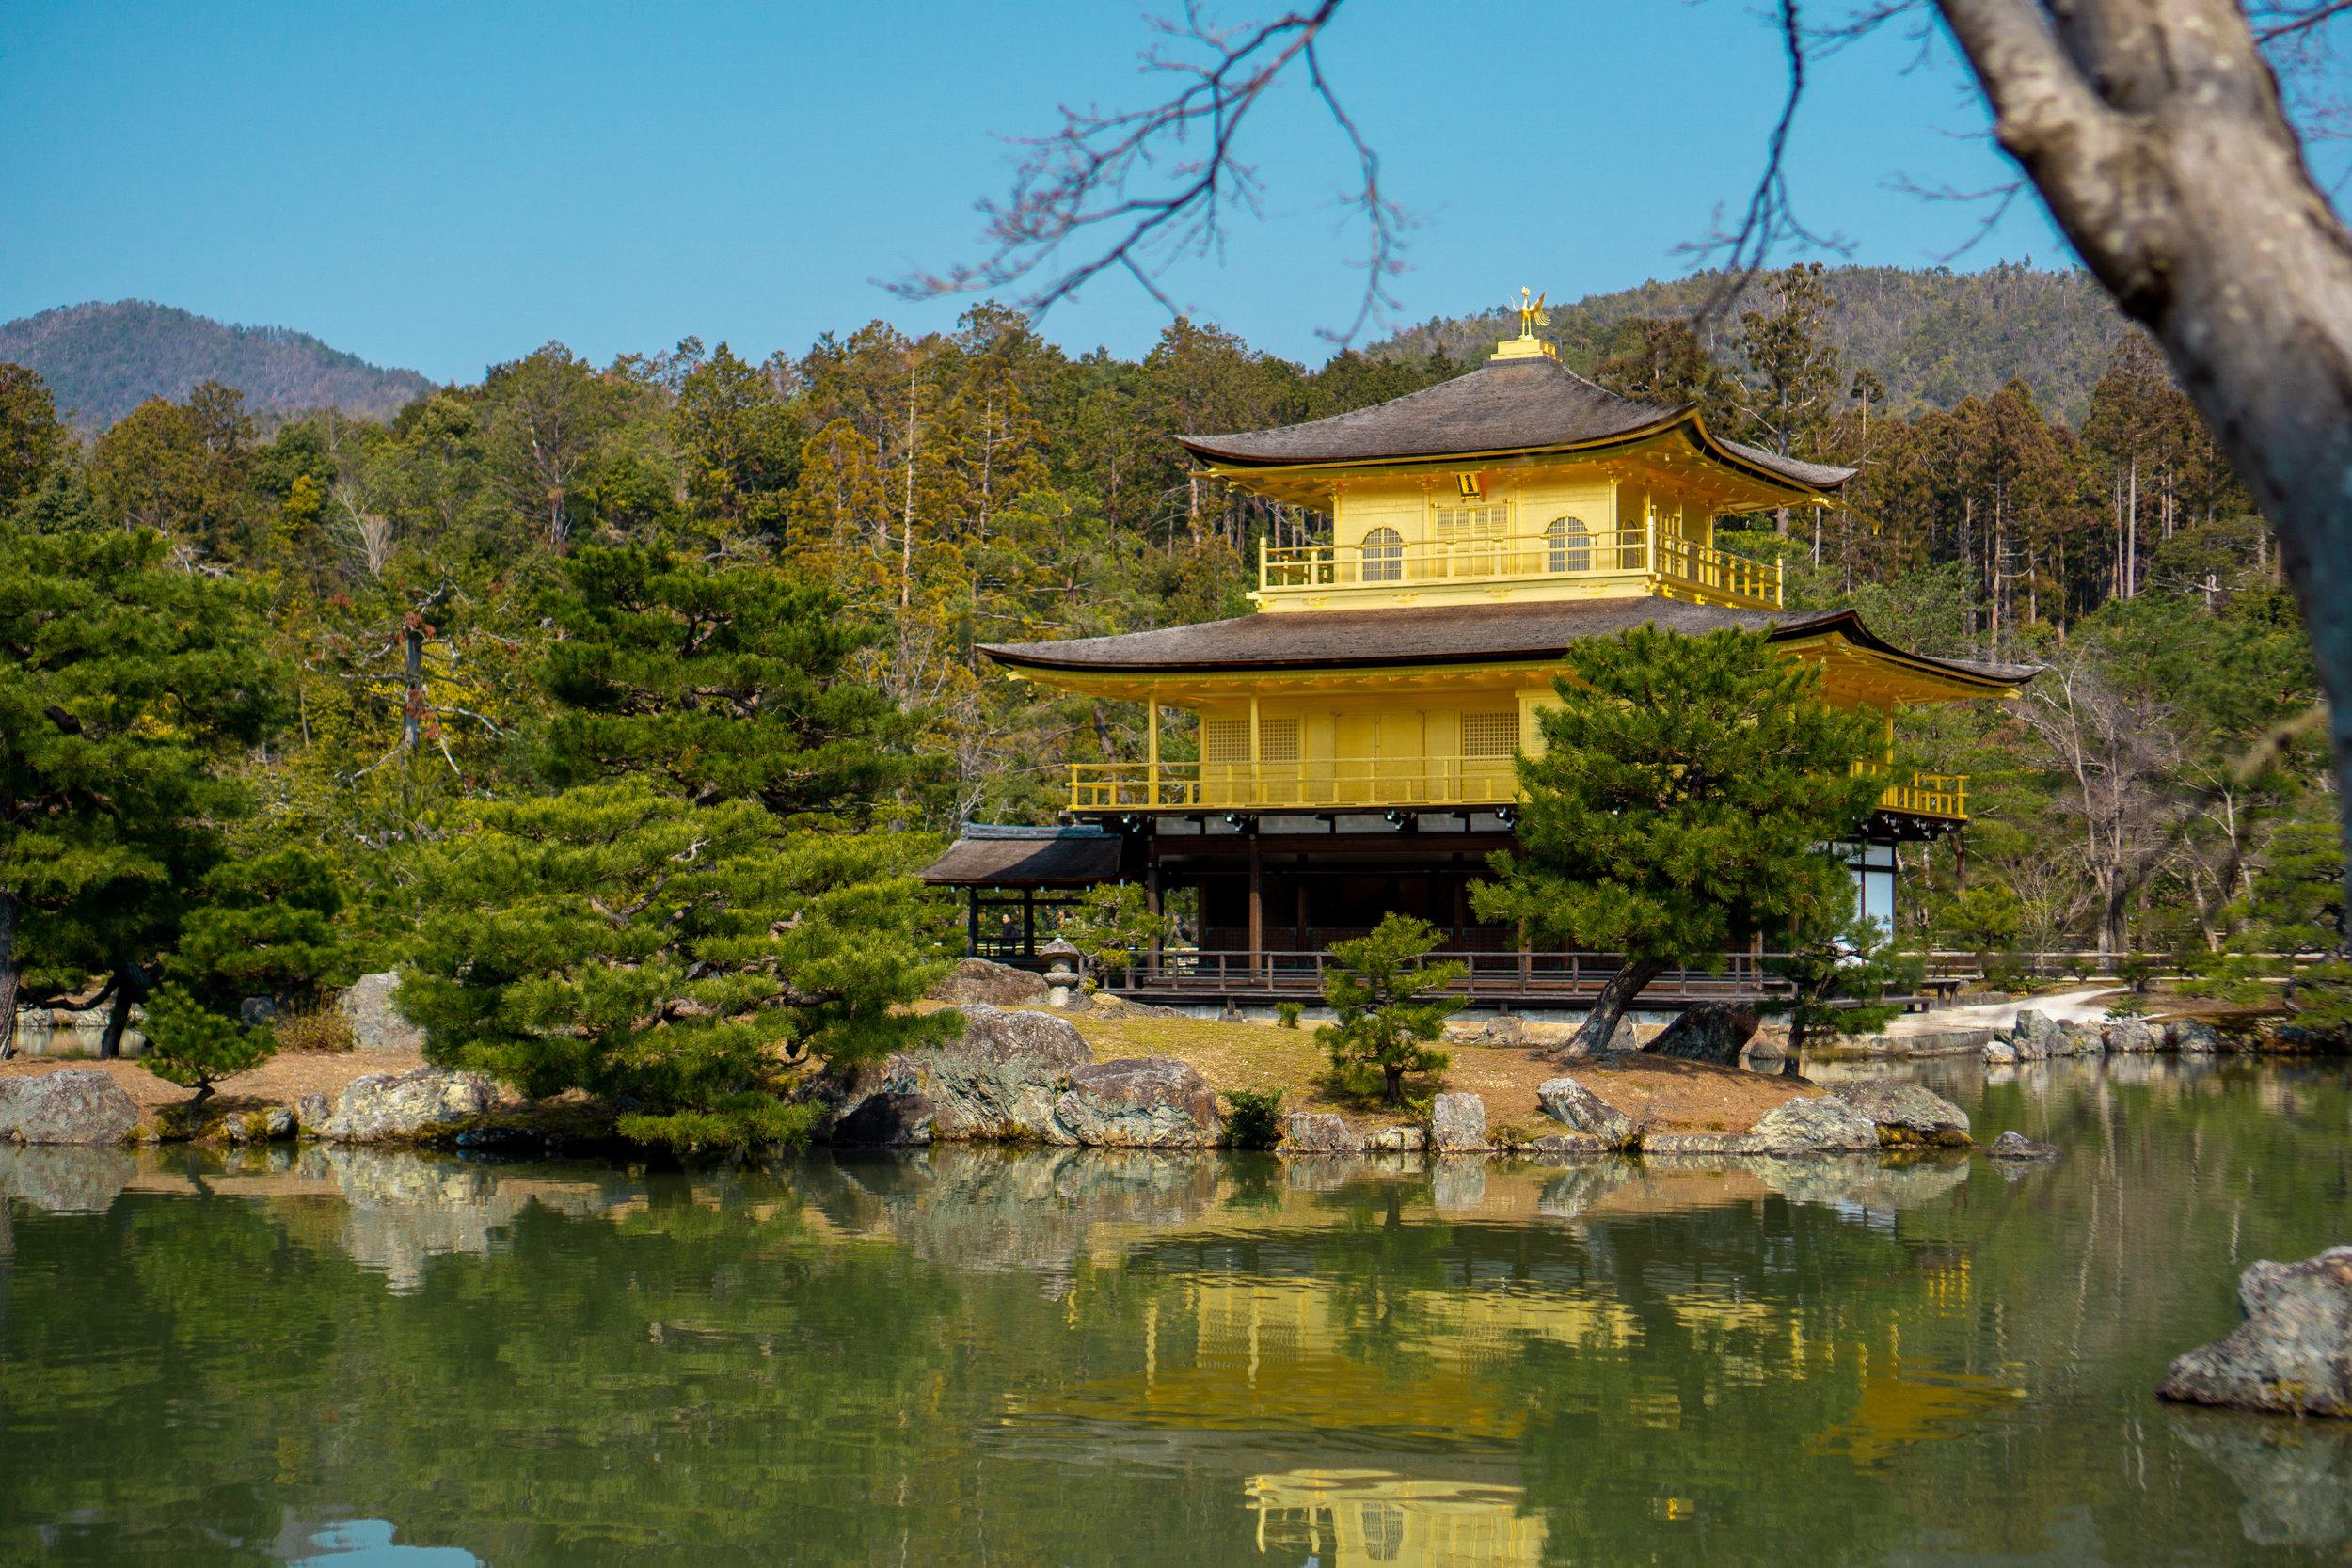 Golden Temple, Kyoto, Japan (Mar 19)